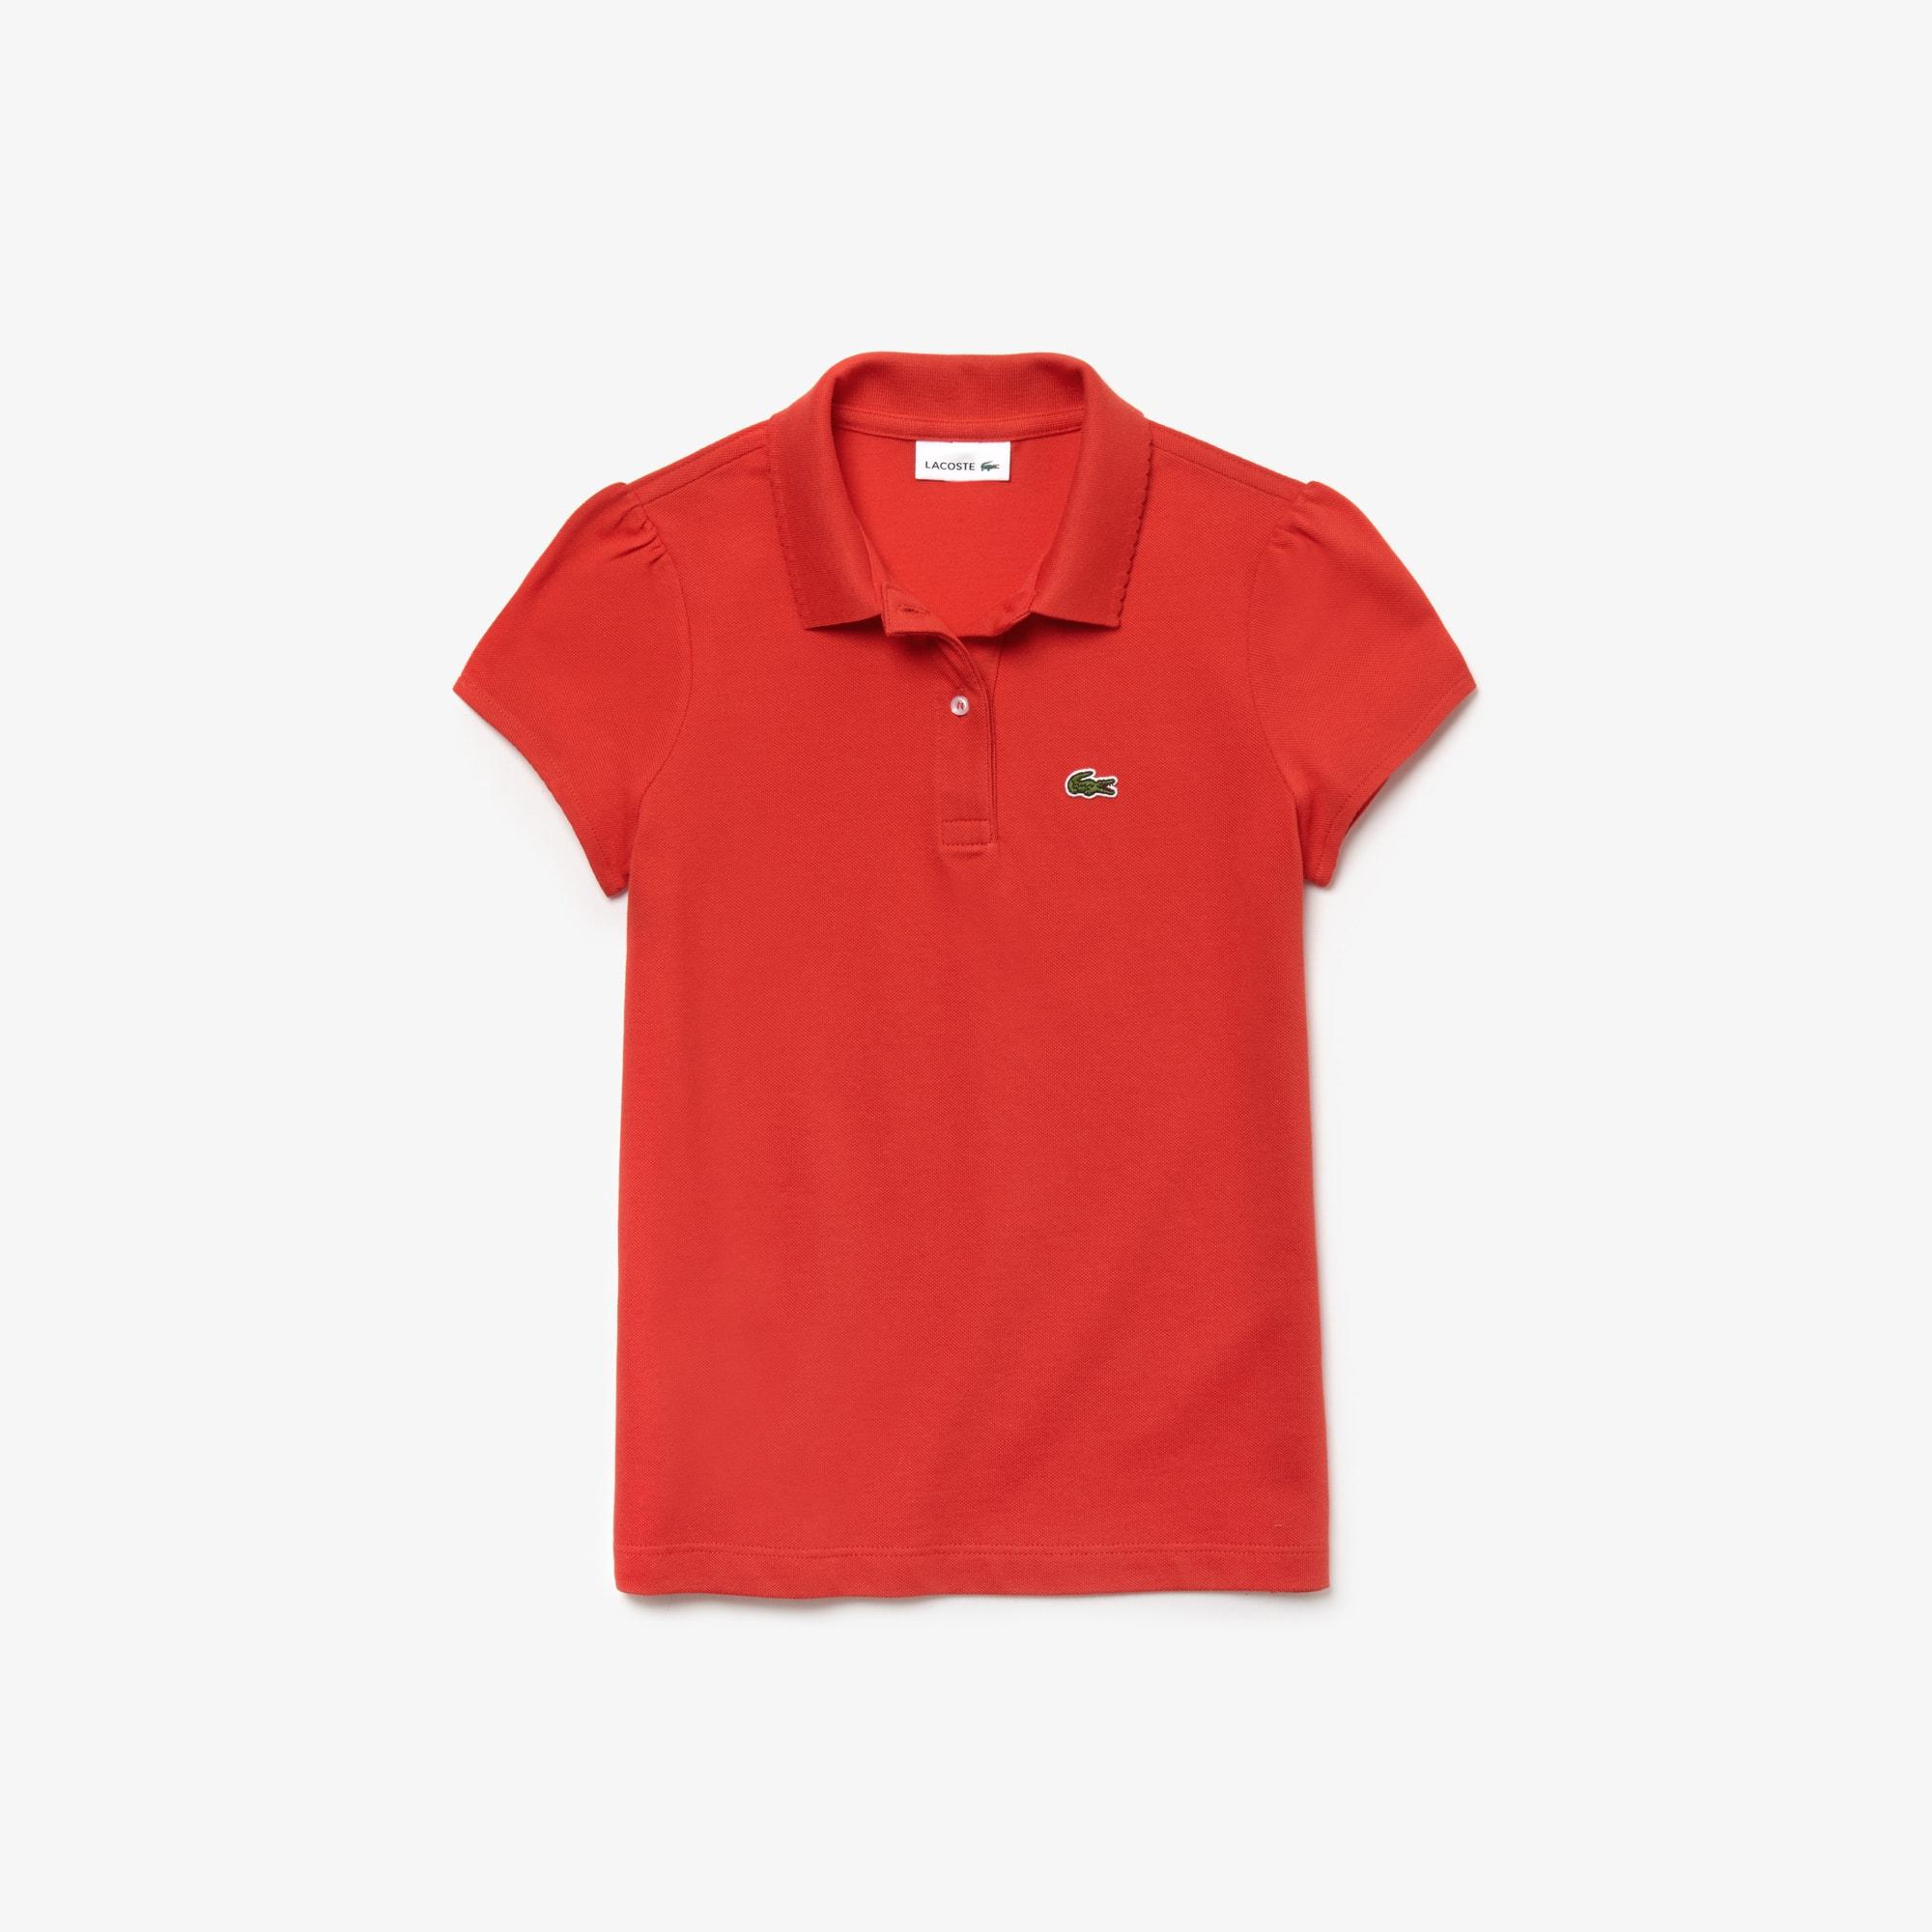 9699e246 Clothing & Shoe collection | Girls Fashion | LACOSTE